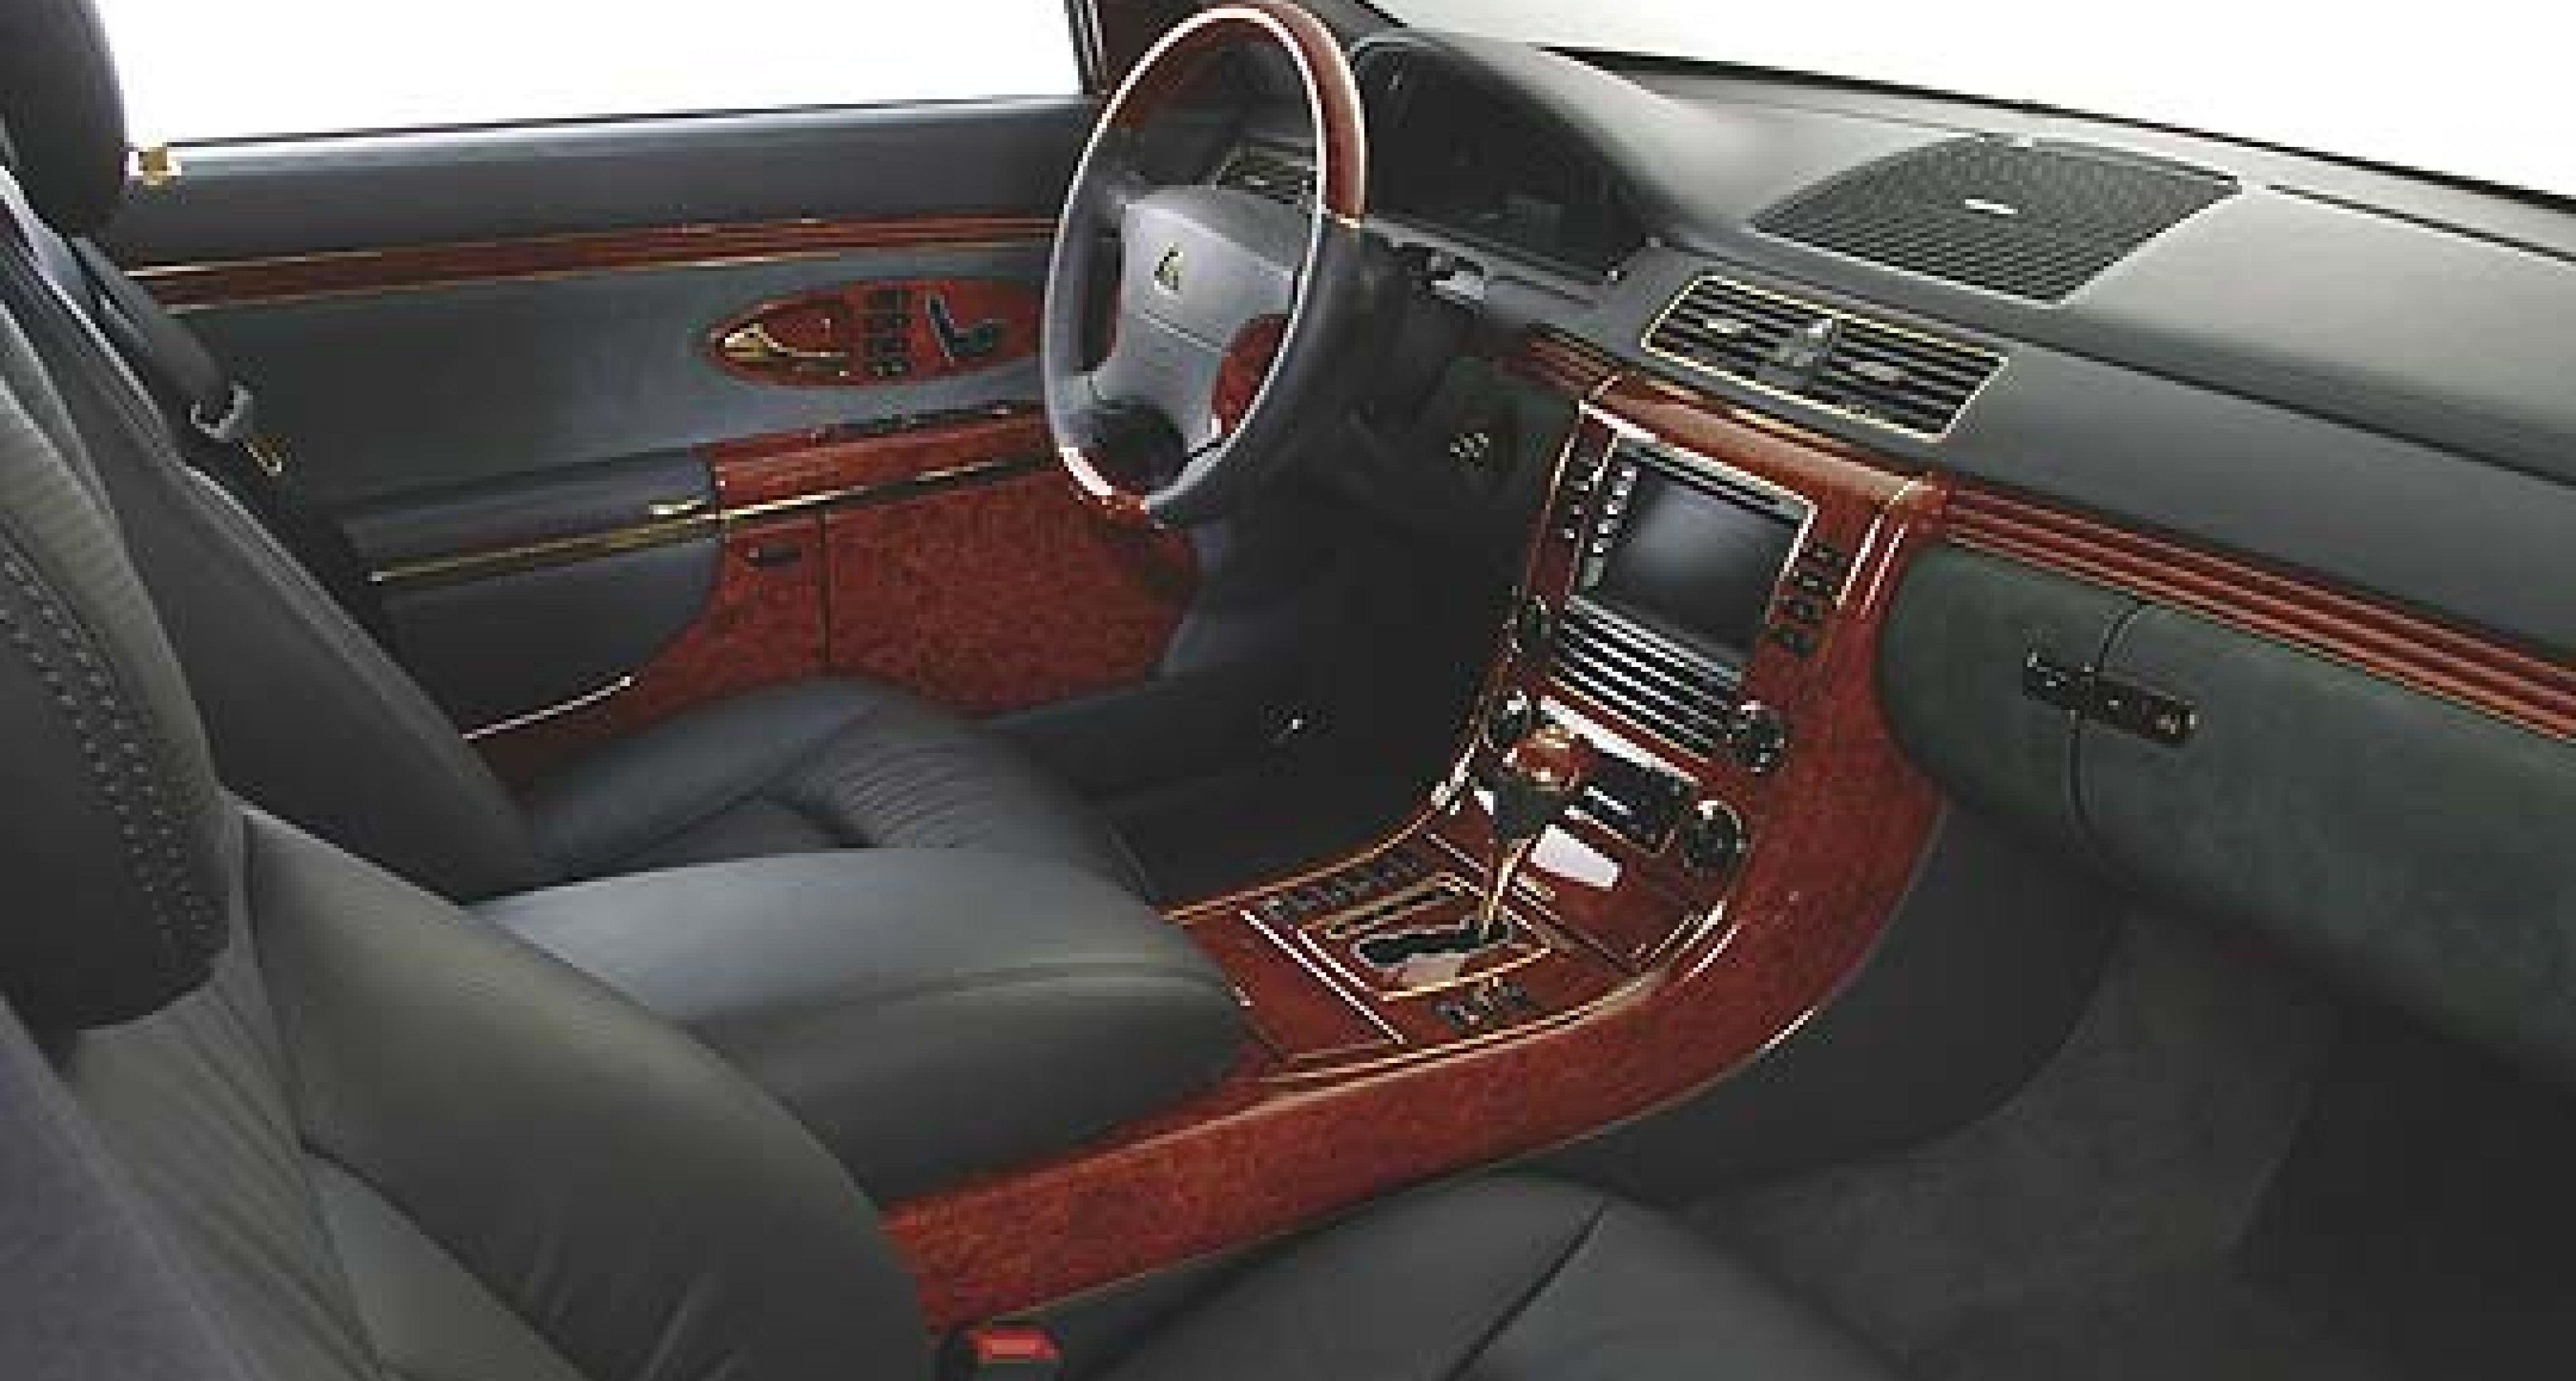 Maybach's brilliant idea: Gold rather than chrome interior